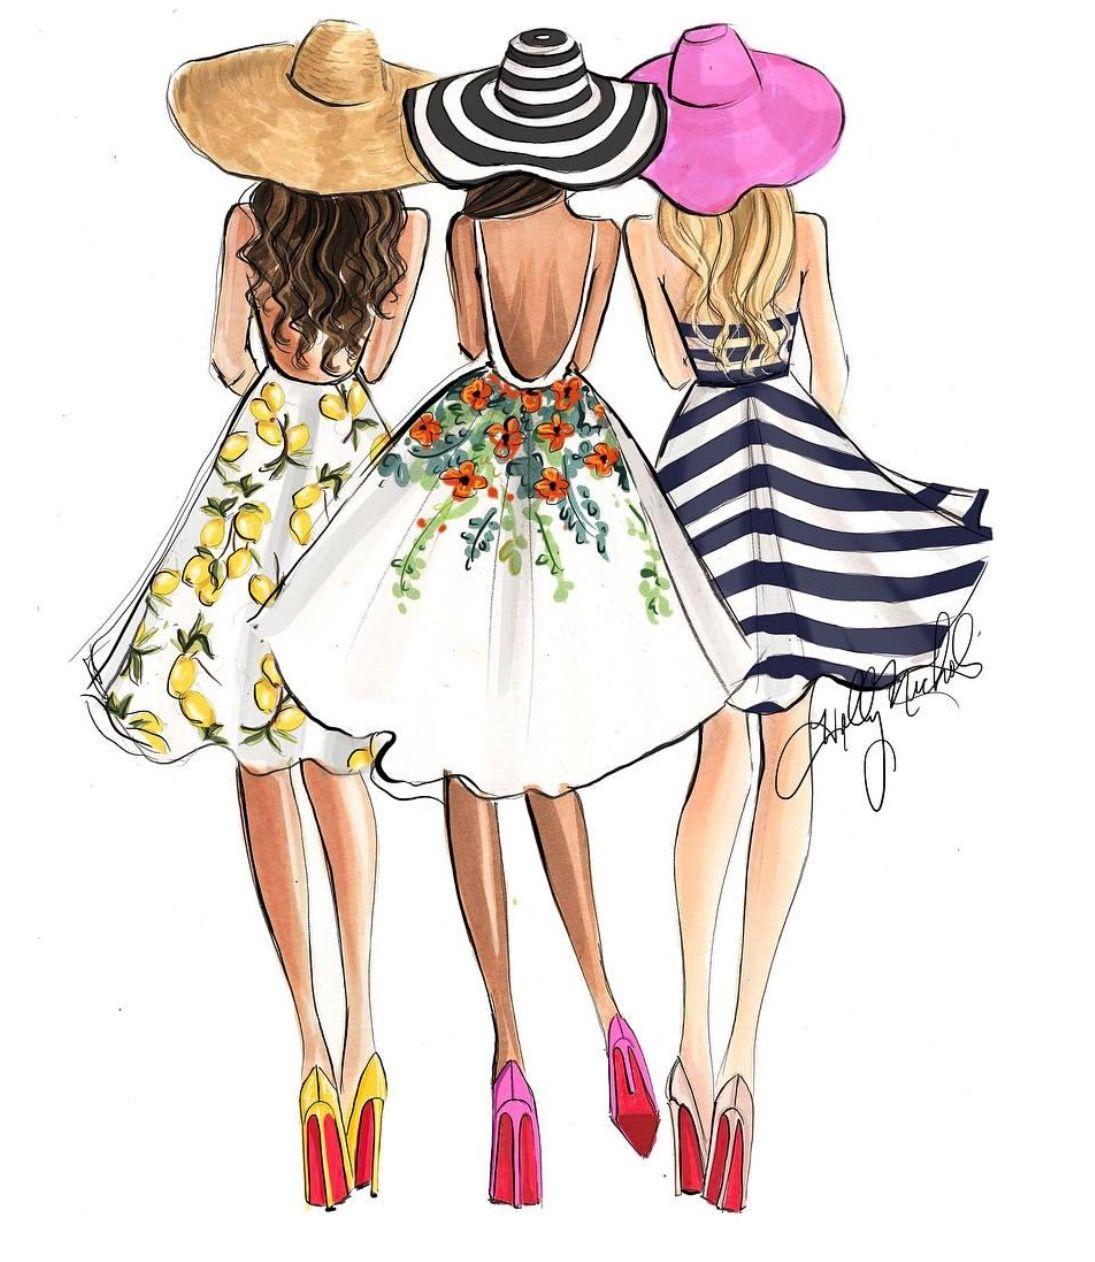 Best La Pinterest: Fashion Illustration, Croqui De Moda, Desenho De Moda . 3